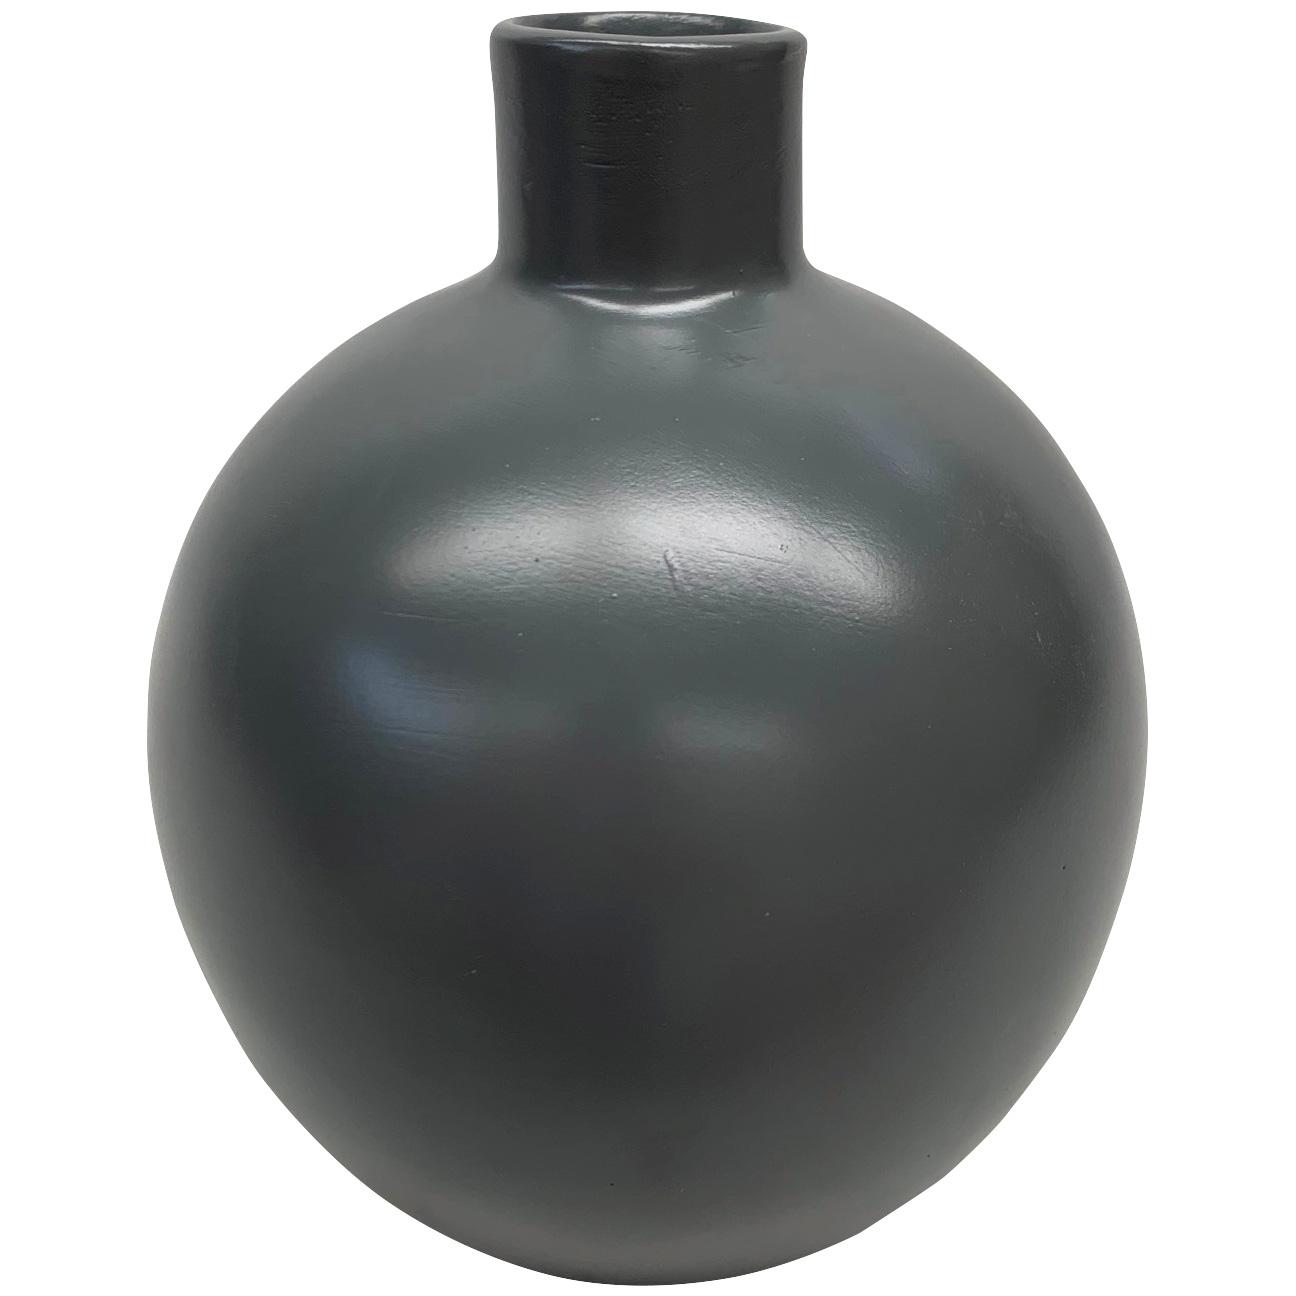 Promart | Terracotta Florero Gray Medium Sphere Vase